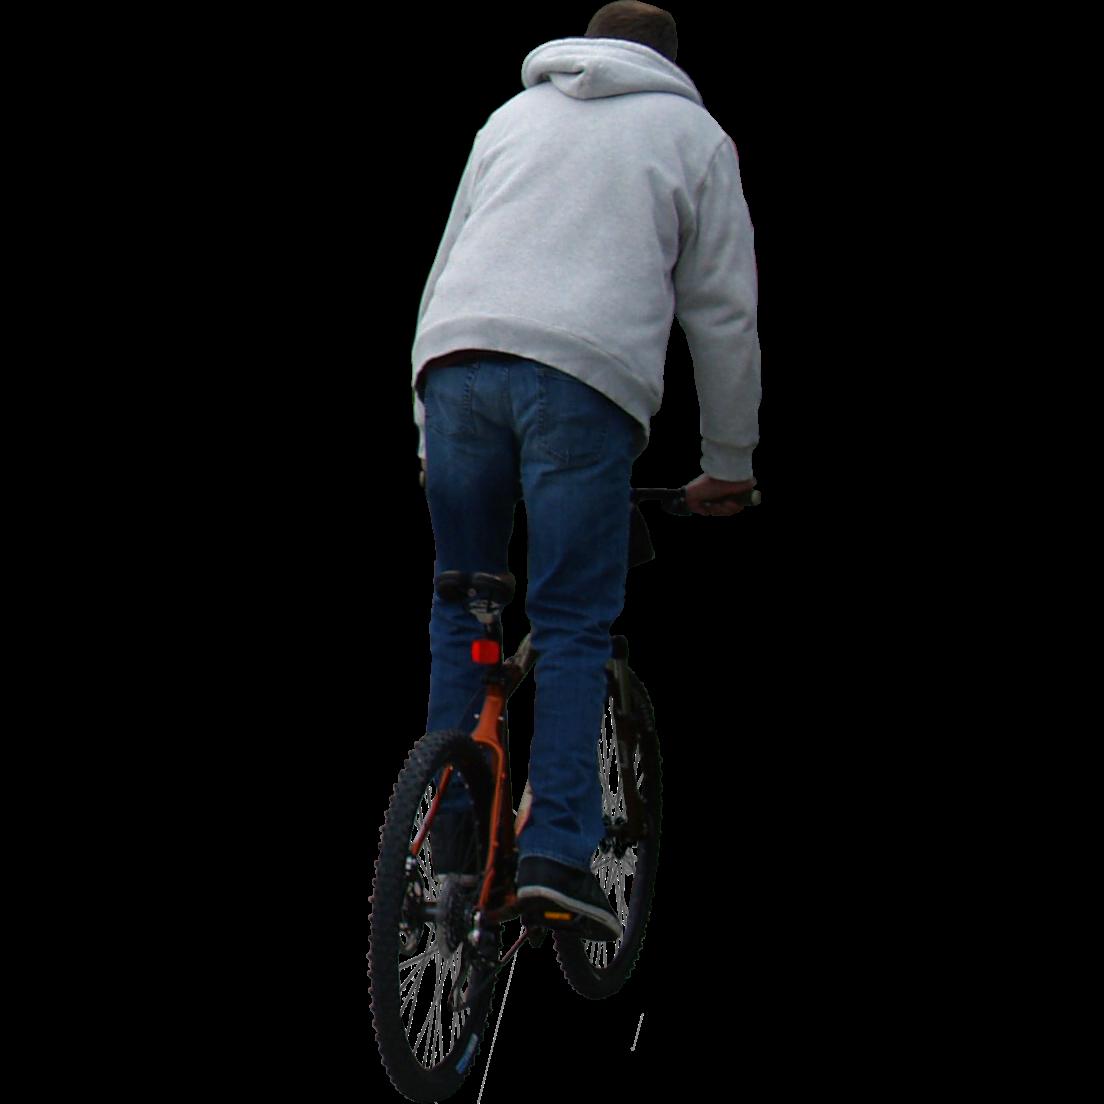 Ride A Bike PNG - 168415